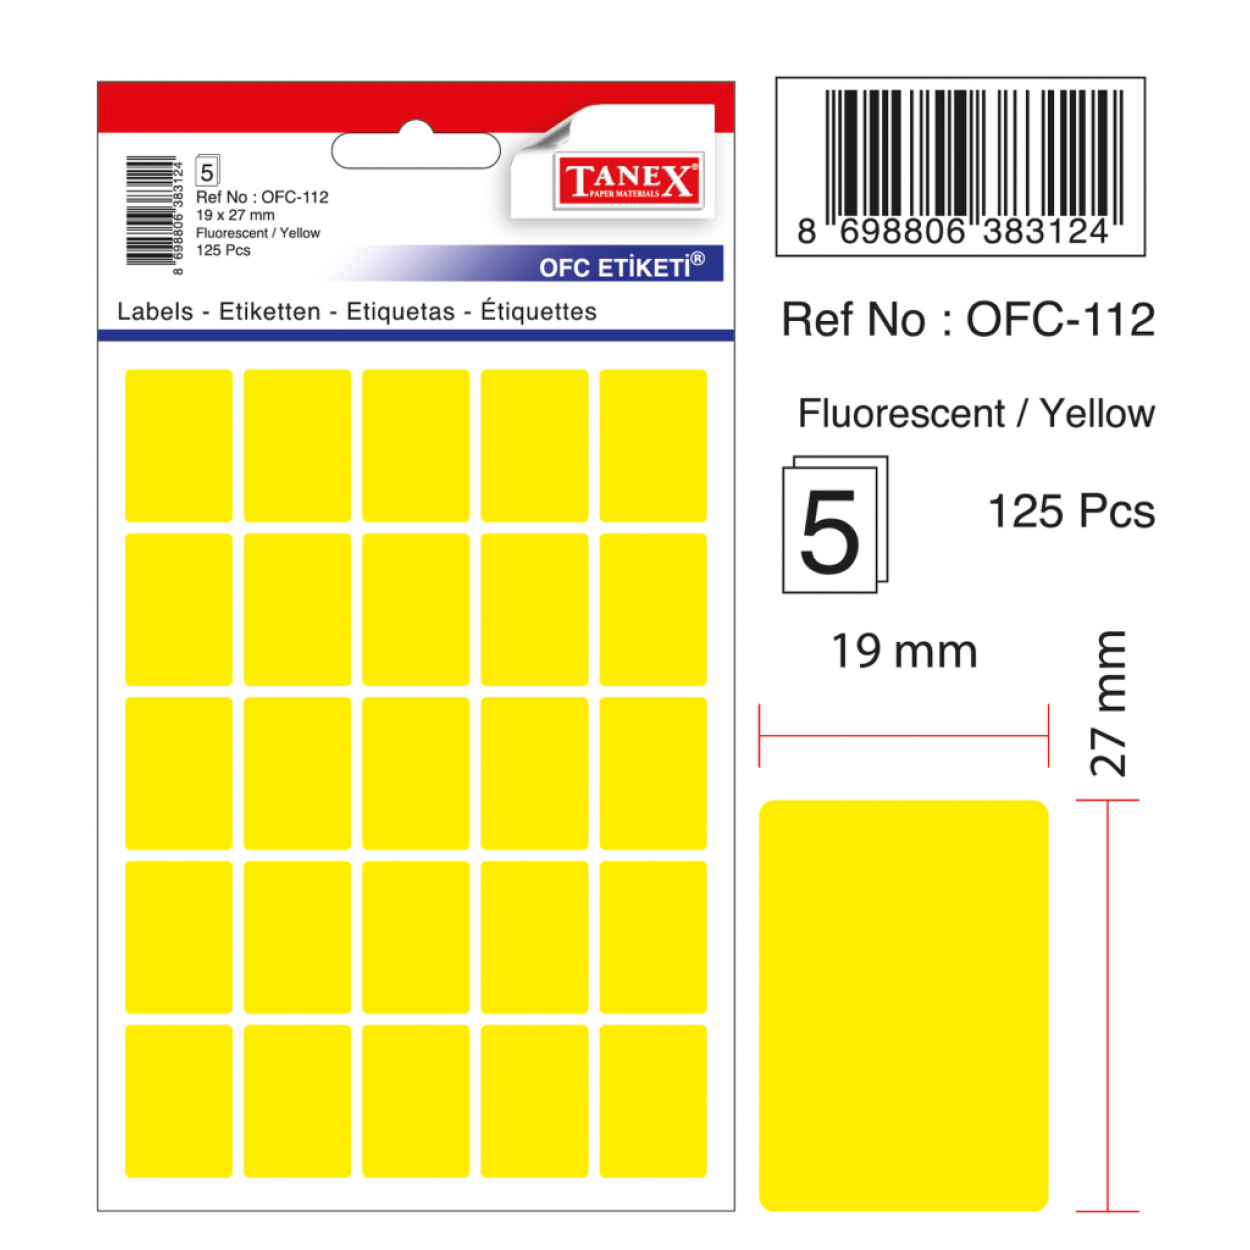 Tanex Ofc-112 Flo Sarı Ofis Etiketi